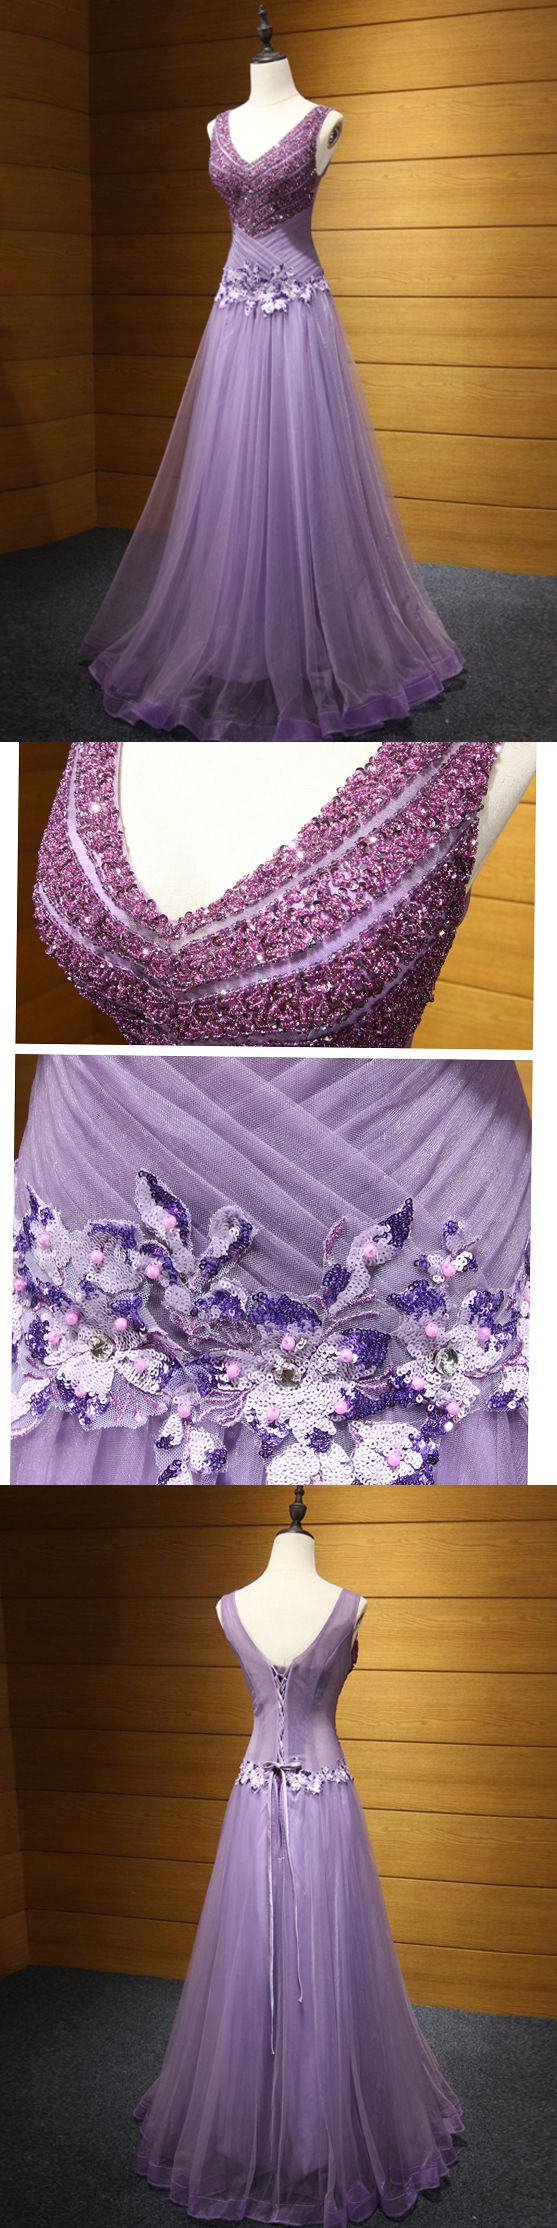 prom dress vneck floorlength beading lavender long prom dress